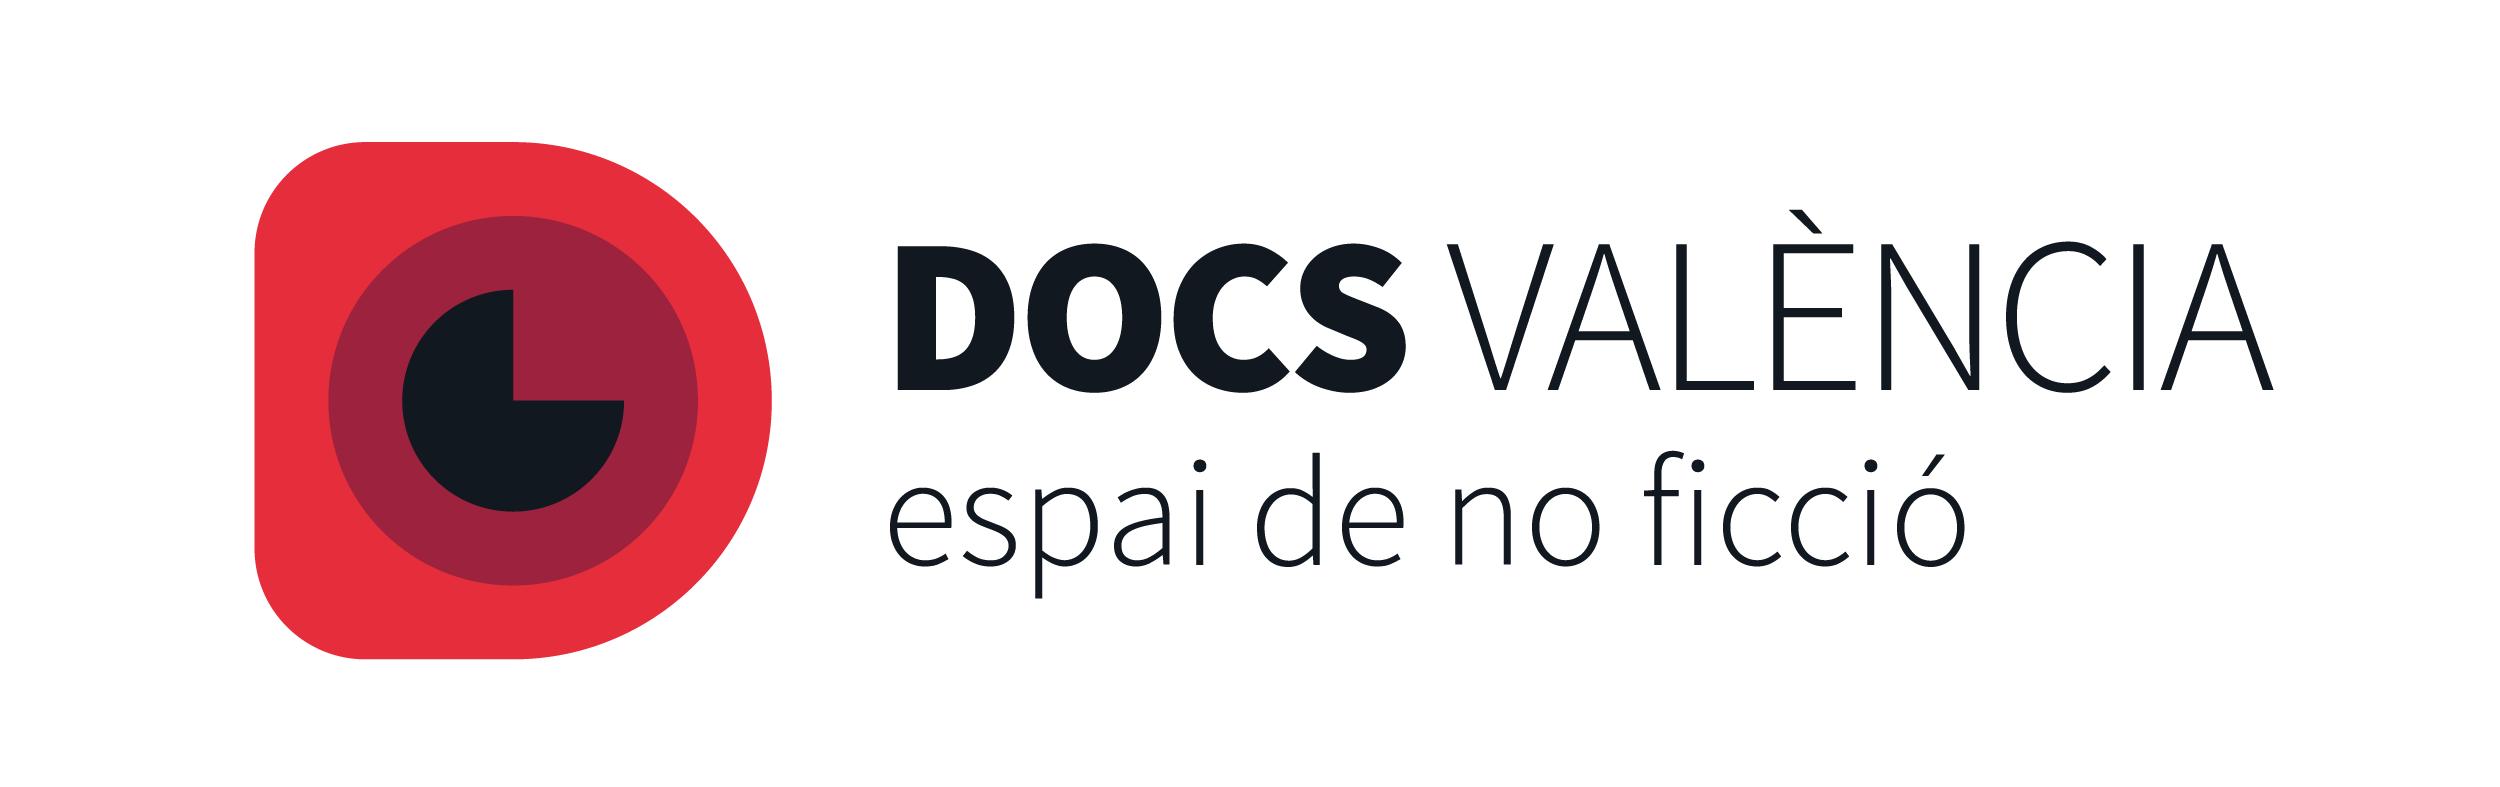 festival docsvalencia